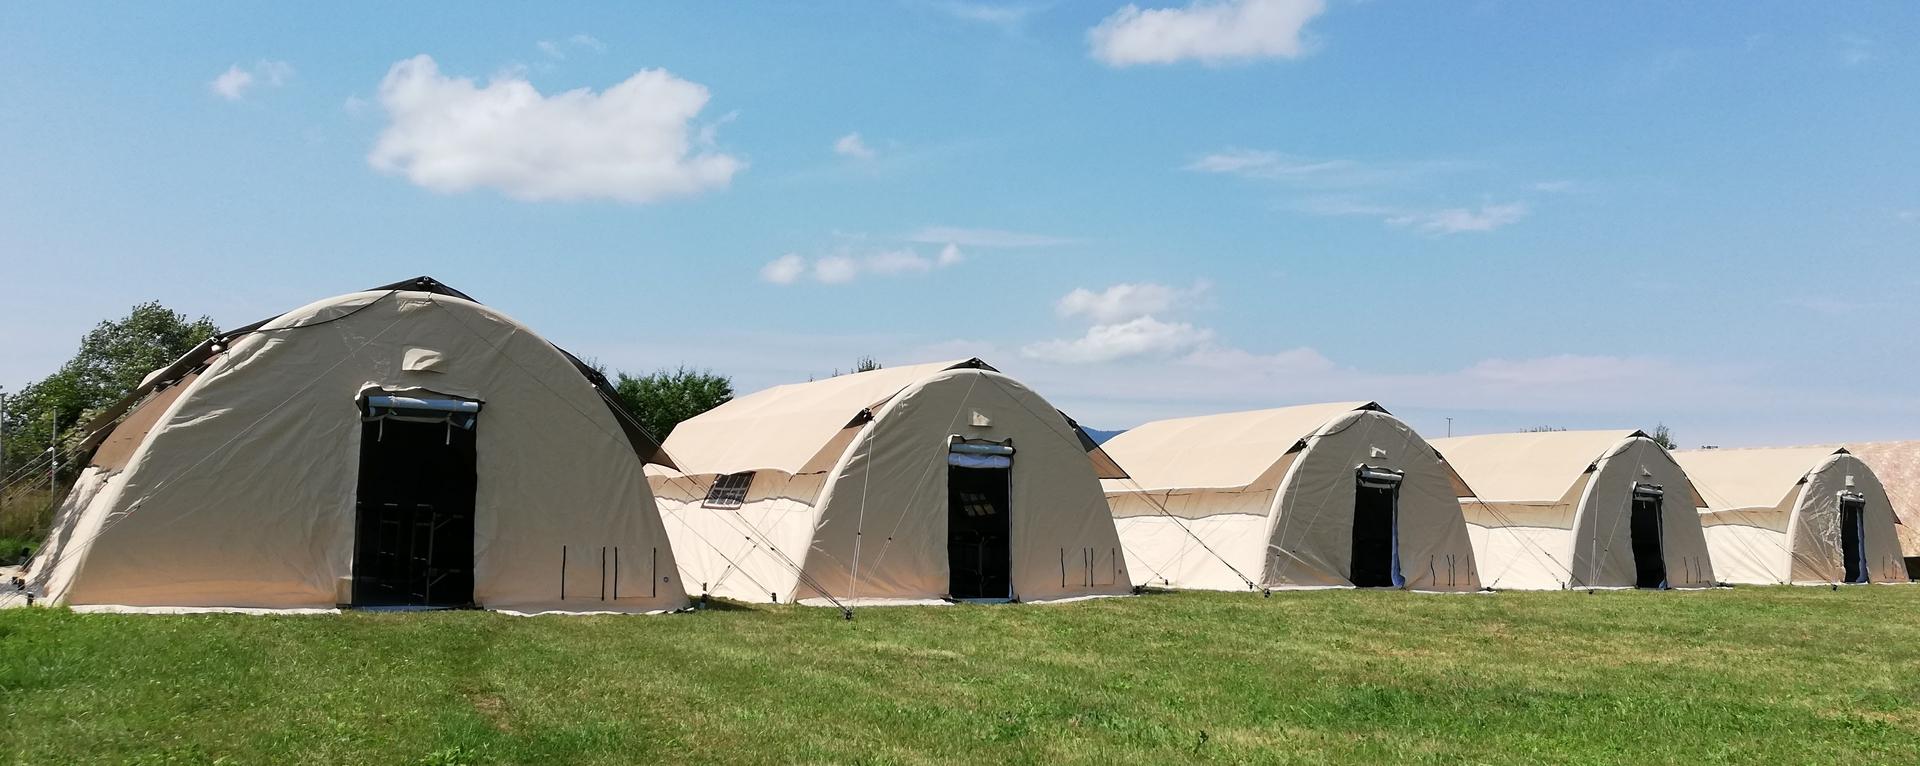 NIXUS PRO Emergency Medical Tents - Triage Tents, Isolation Tents, Hospital Tents